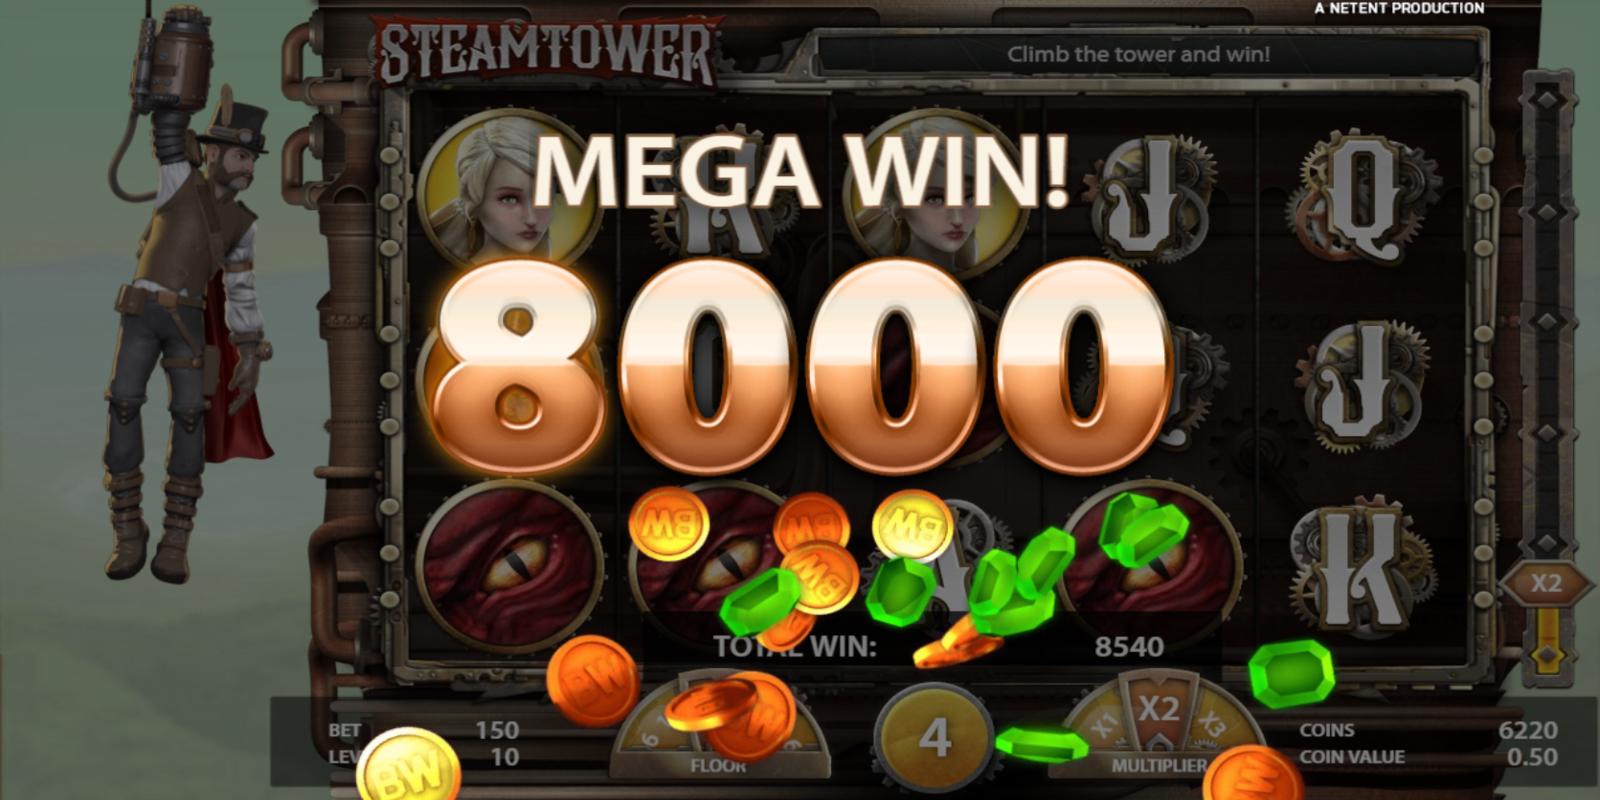 Steam Tower Slot Big Win